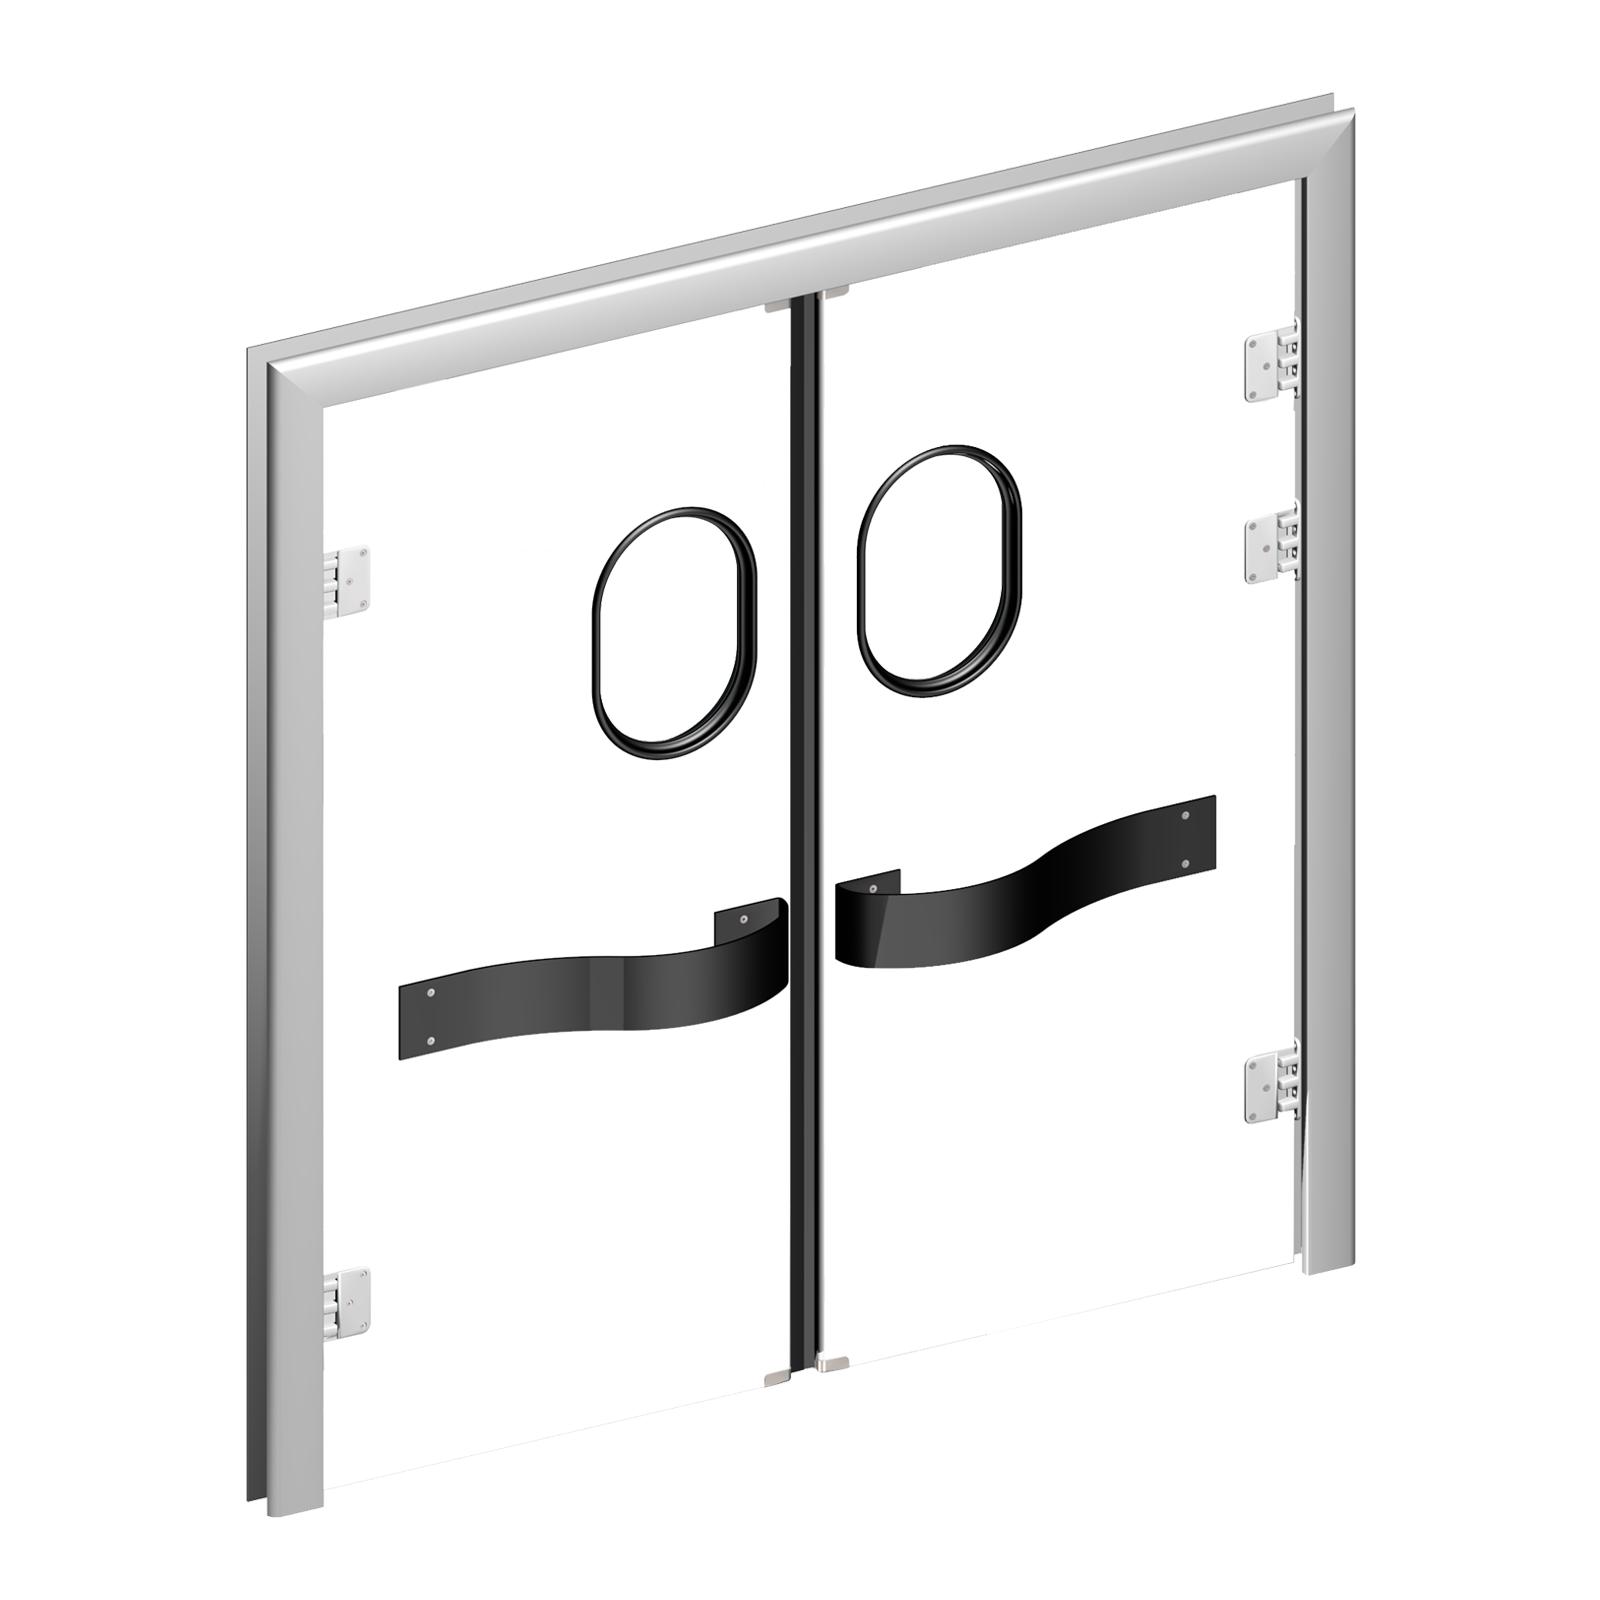 Porte industriali scorrevoli pluripanel alta qualit per porte va e vieni - Porte va e vieni per interni ...